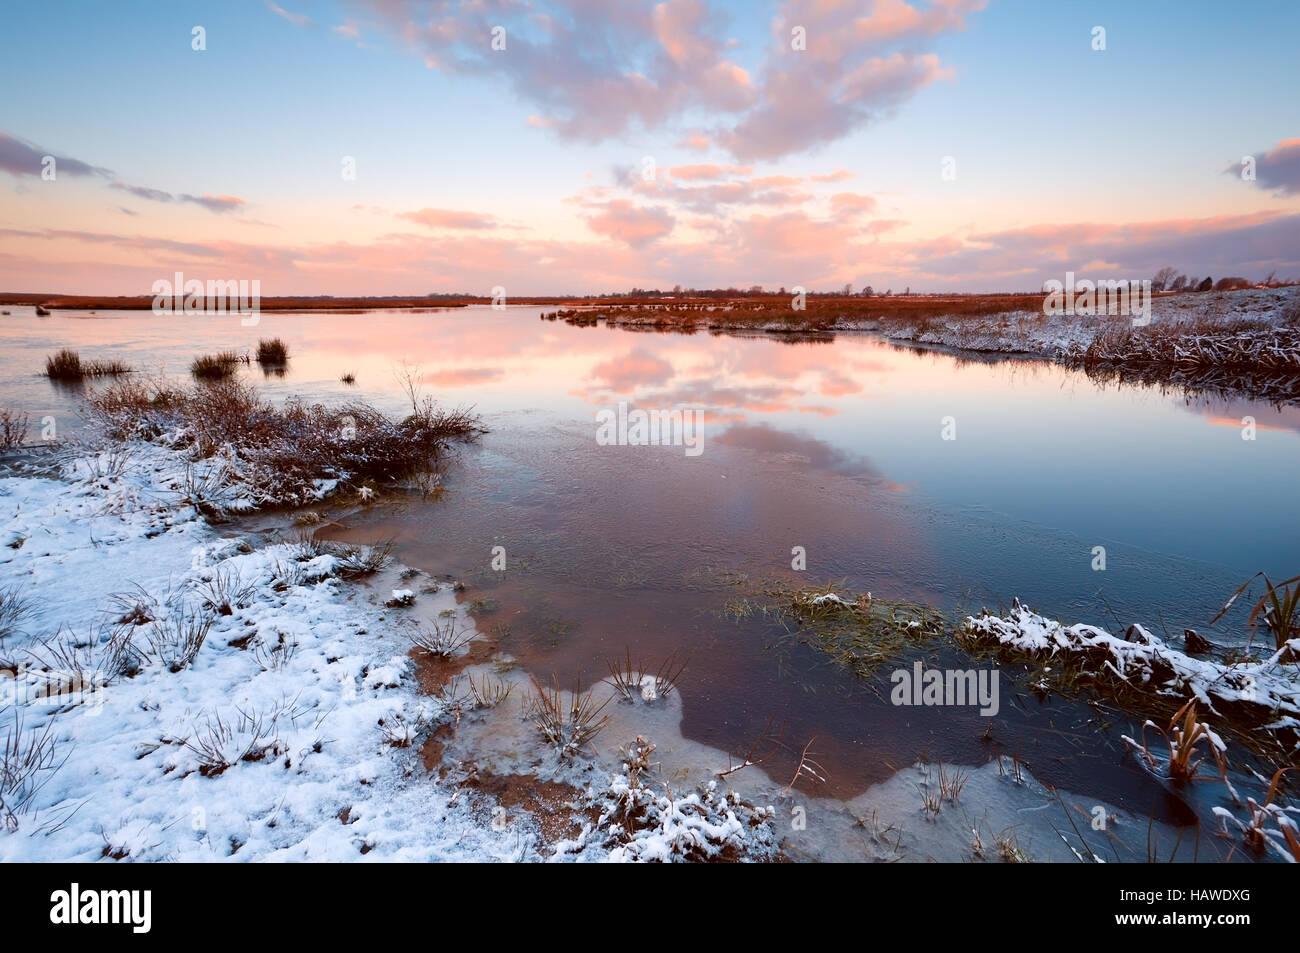 Sunrsie über Fluss im winter Stockbild